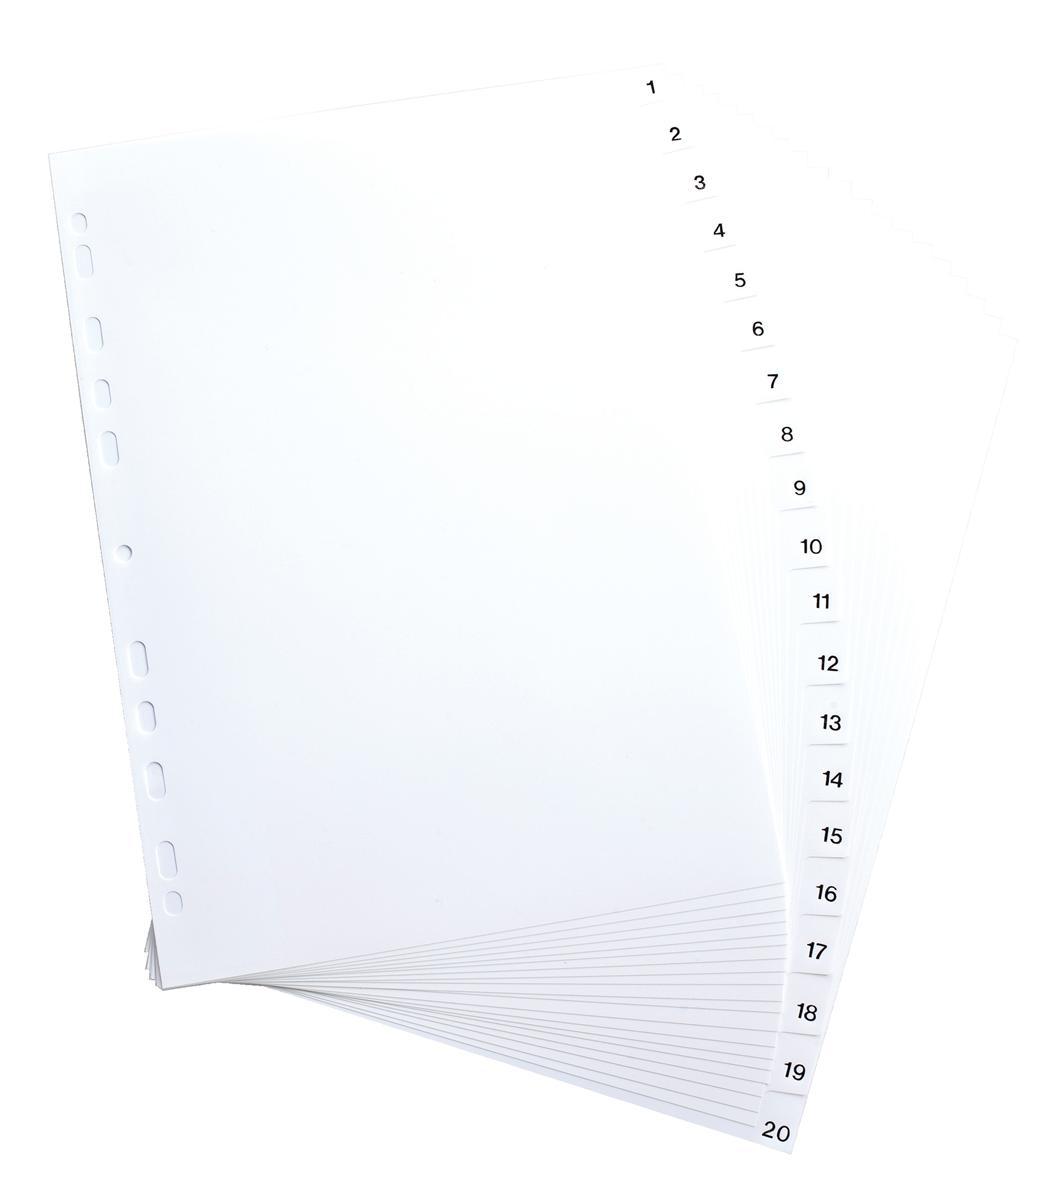 Elba Polypropylene Index Europunched A4 1-20 White Ref 100204786